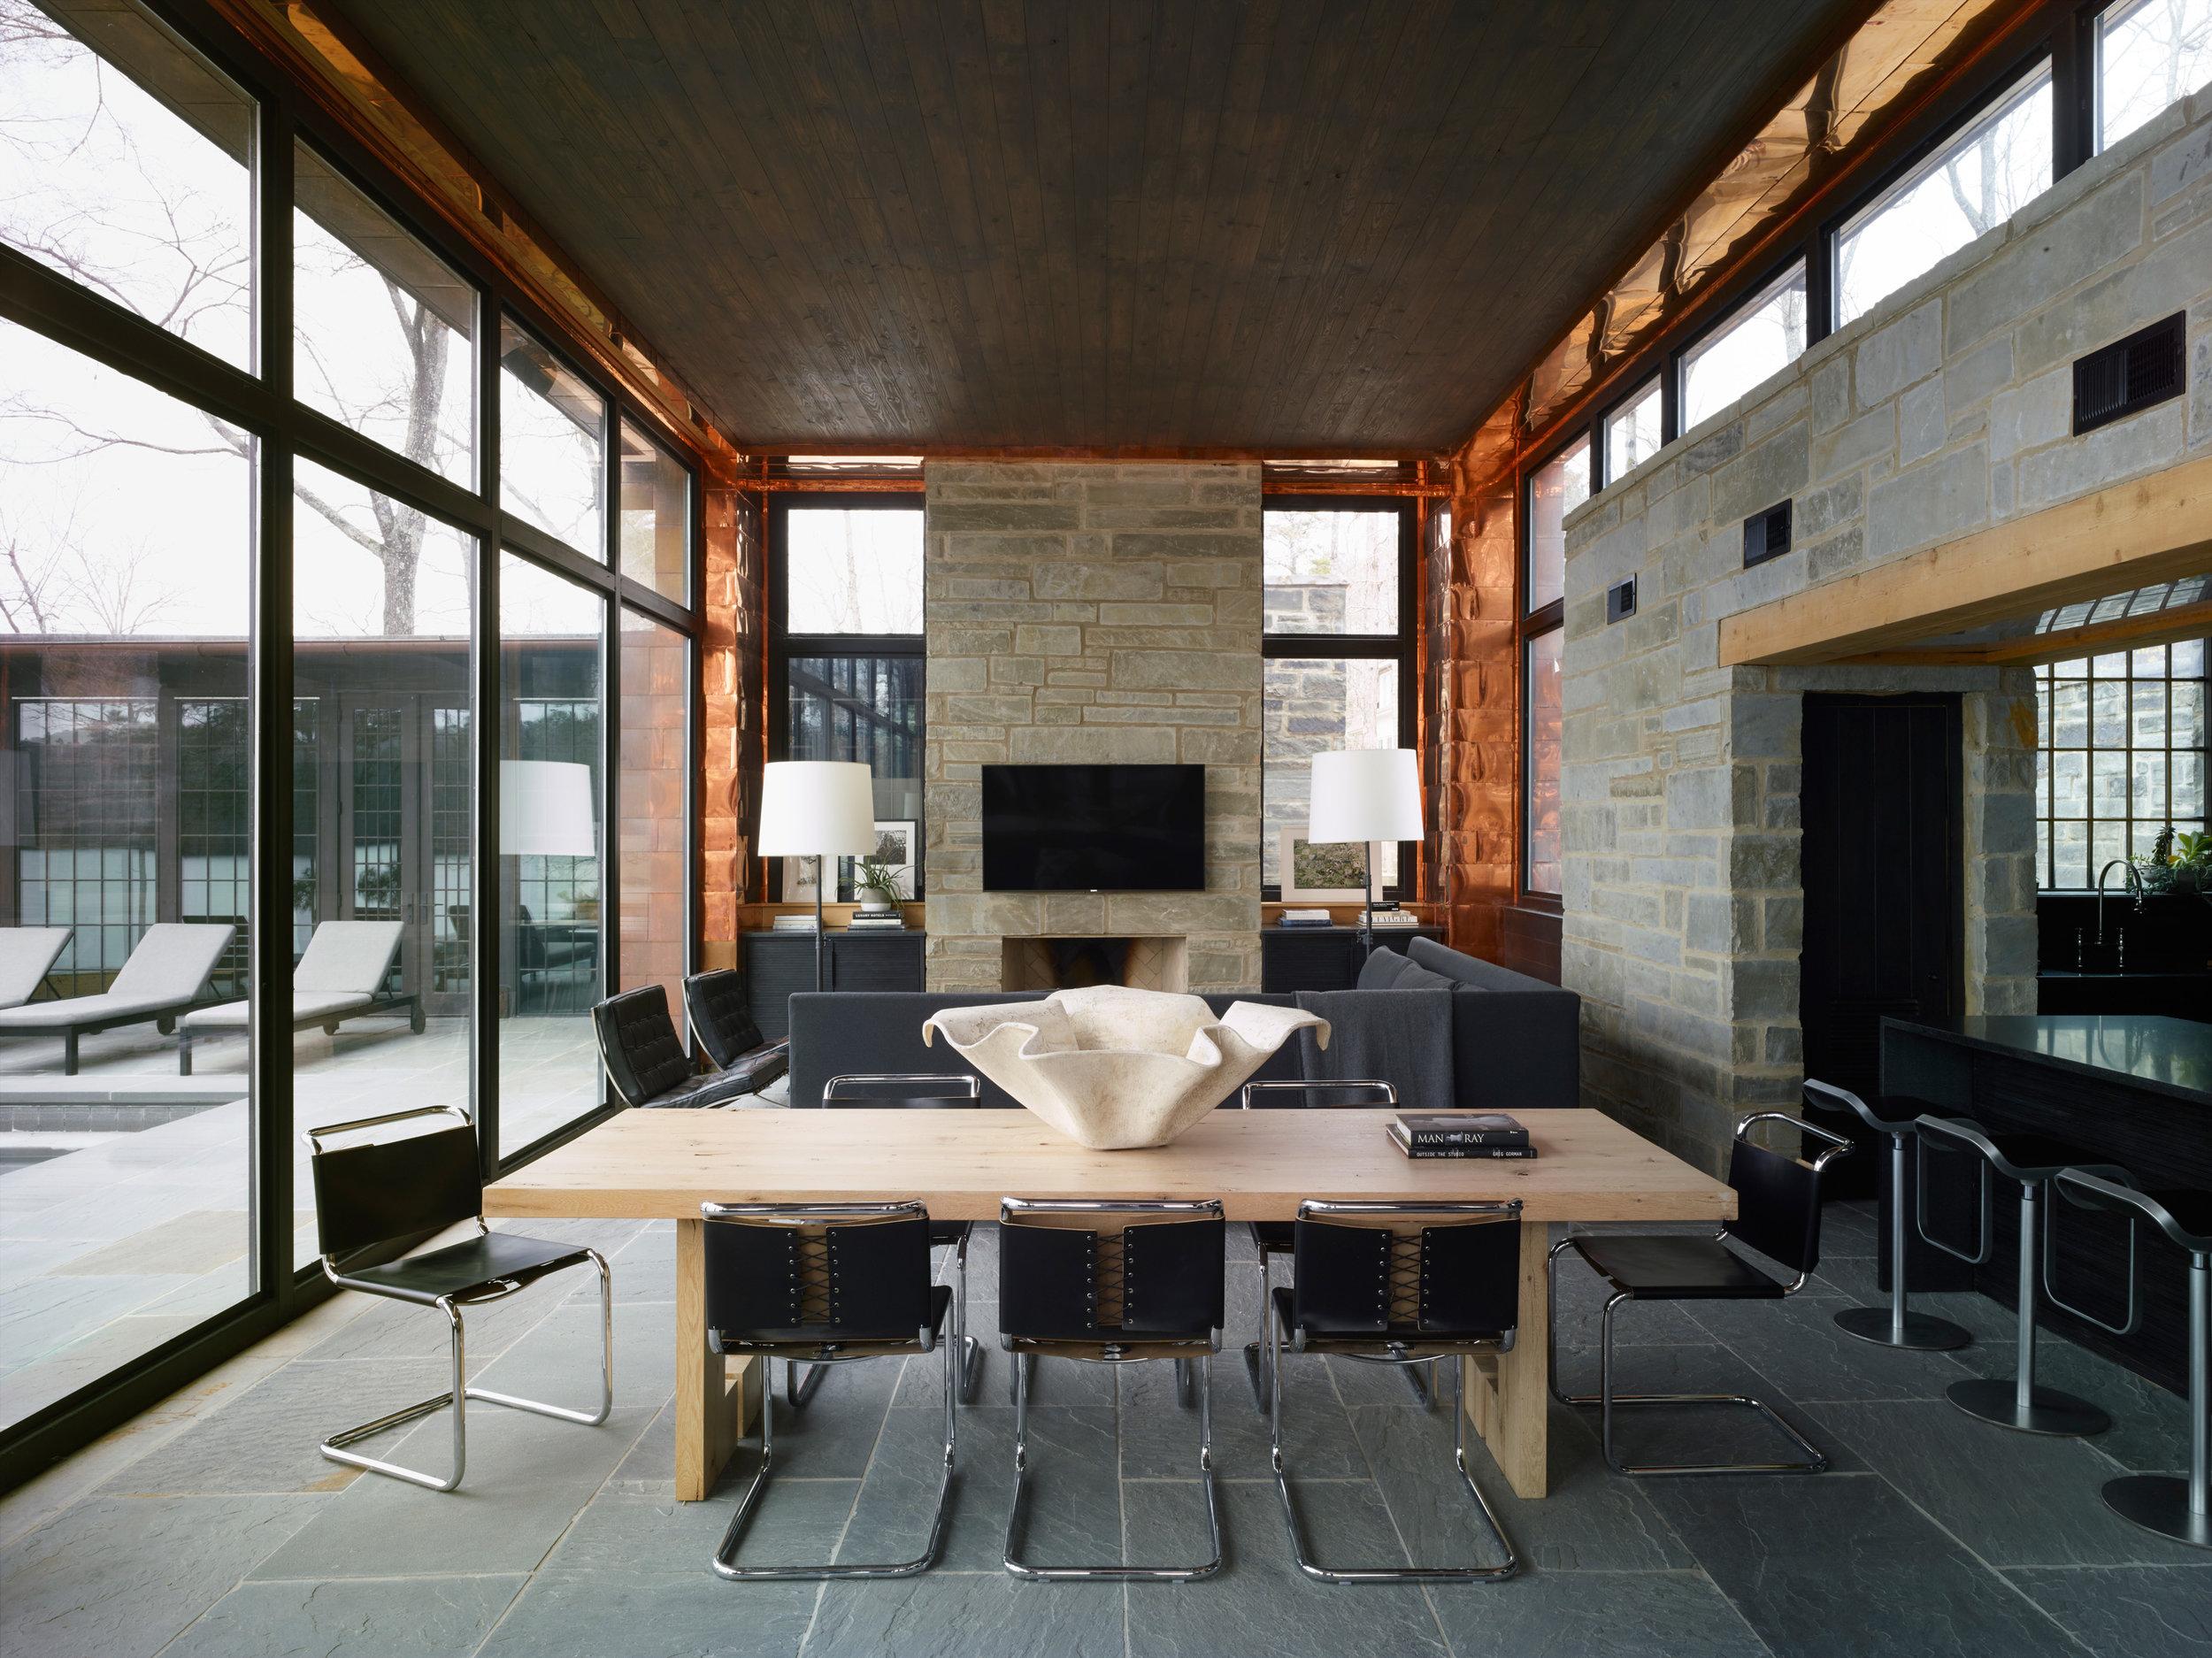 Nequette Architecture & Design